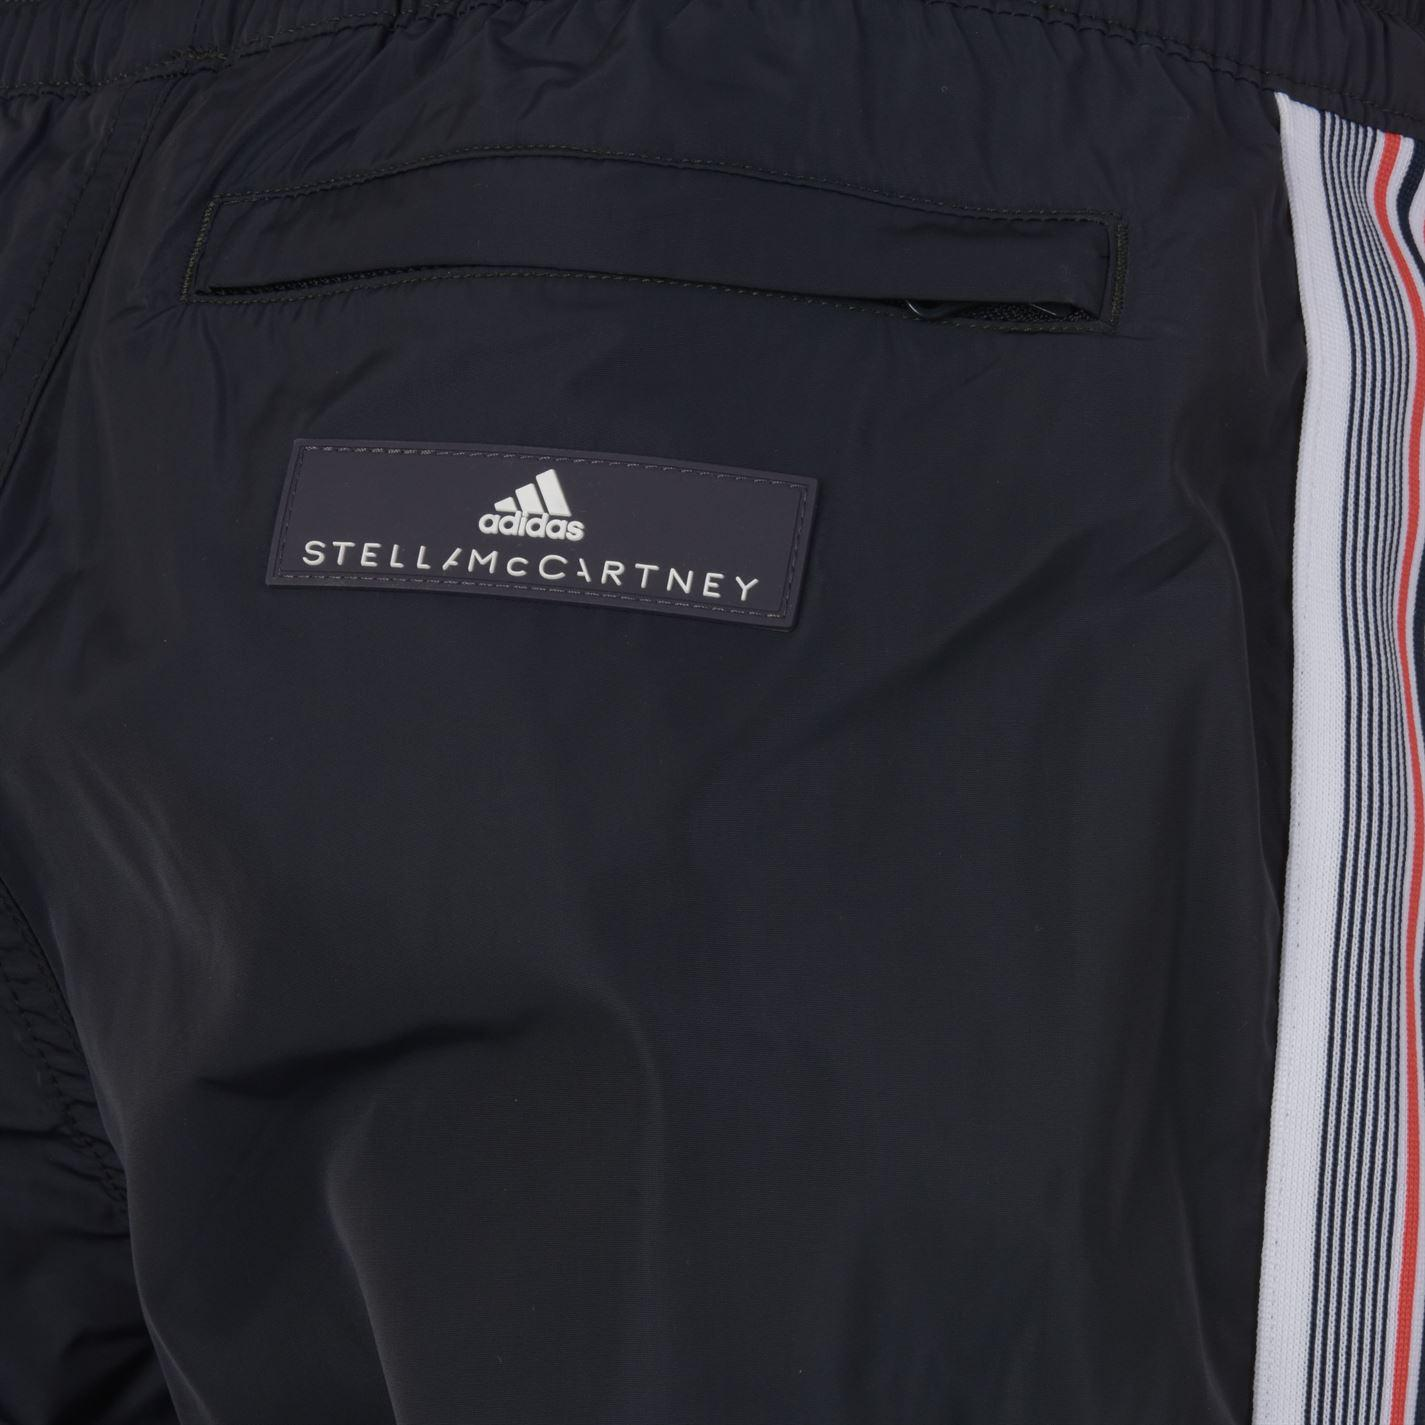 Lyst Adidas By Stella azul Mccartney Adidas Pantalones Popper de chándal Popper en azul f3a79fd - hvorvikankobe.website